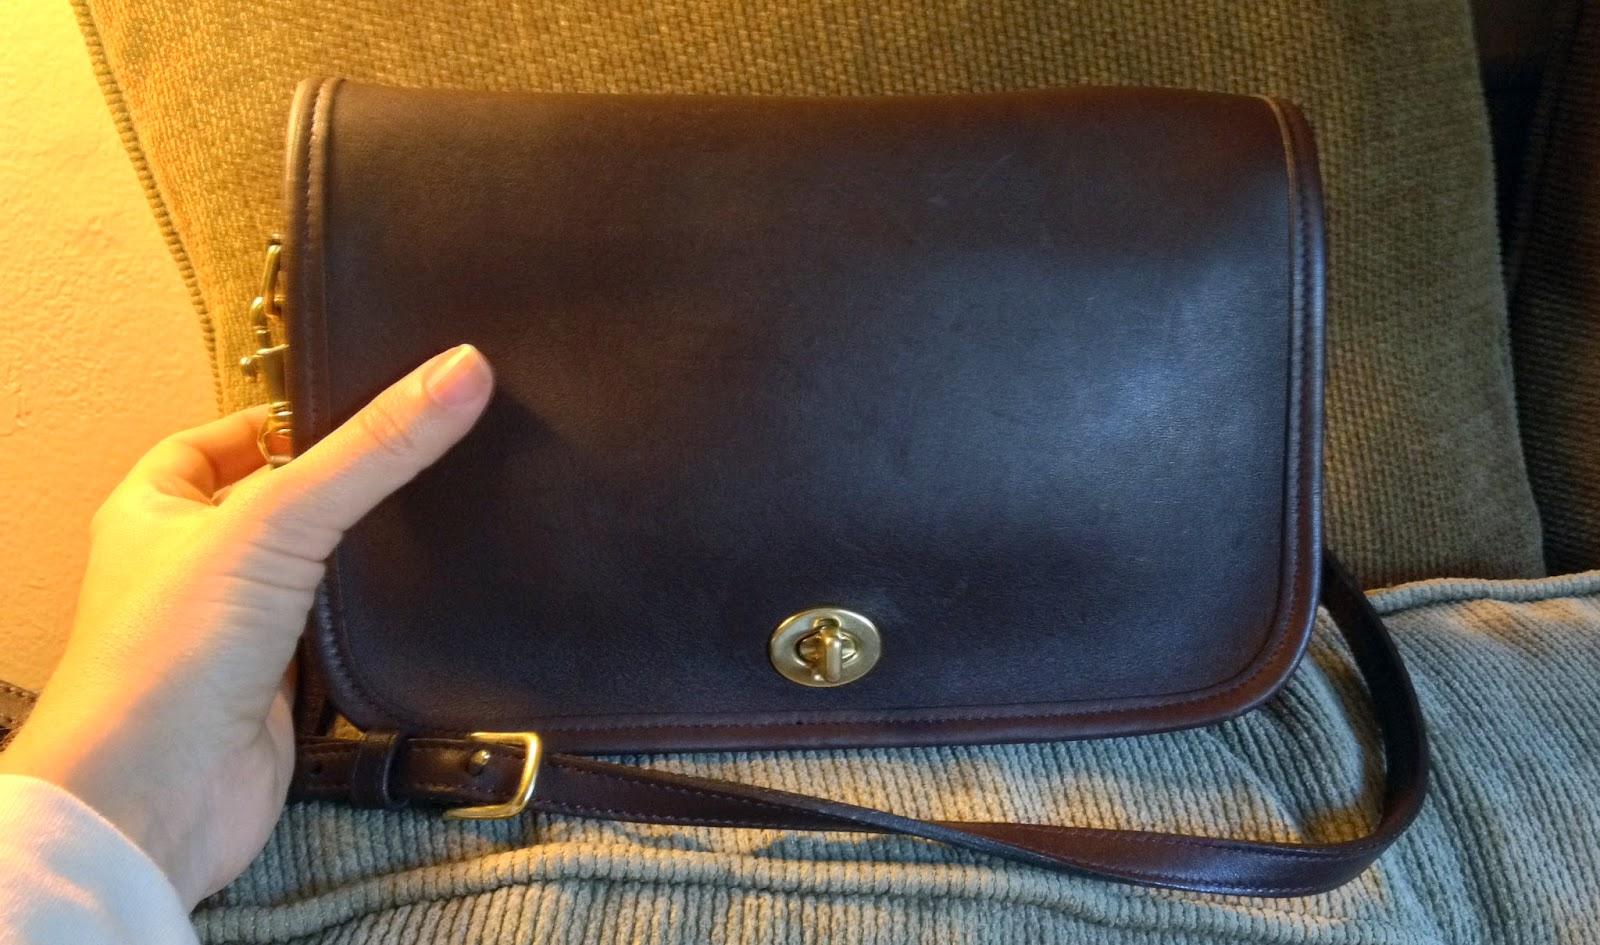 b4aecff842 ... switzerland coach handbag used handbags 2018 b400f e29a5